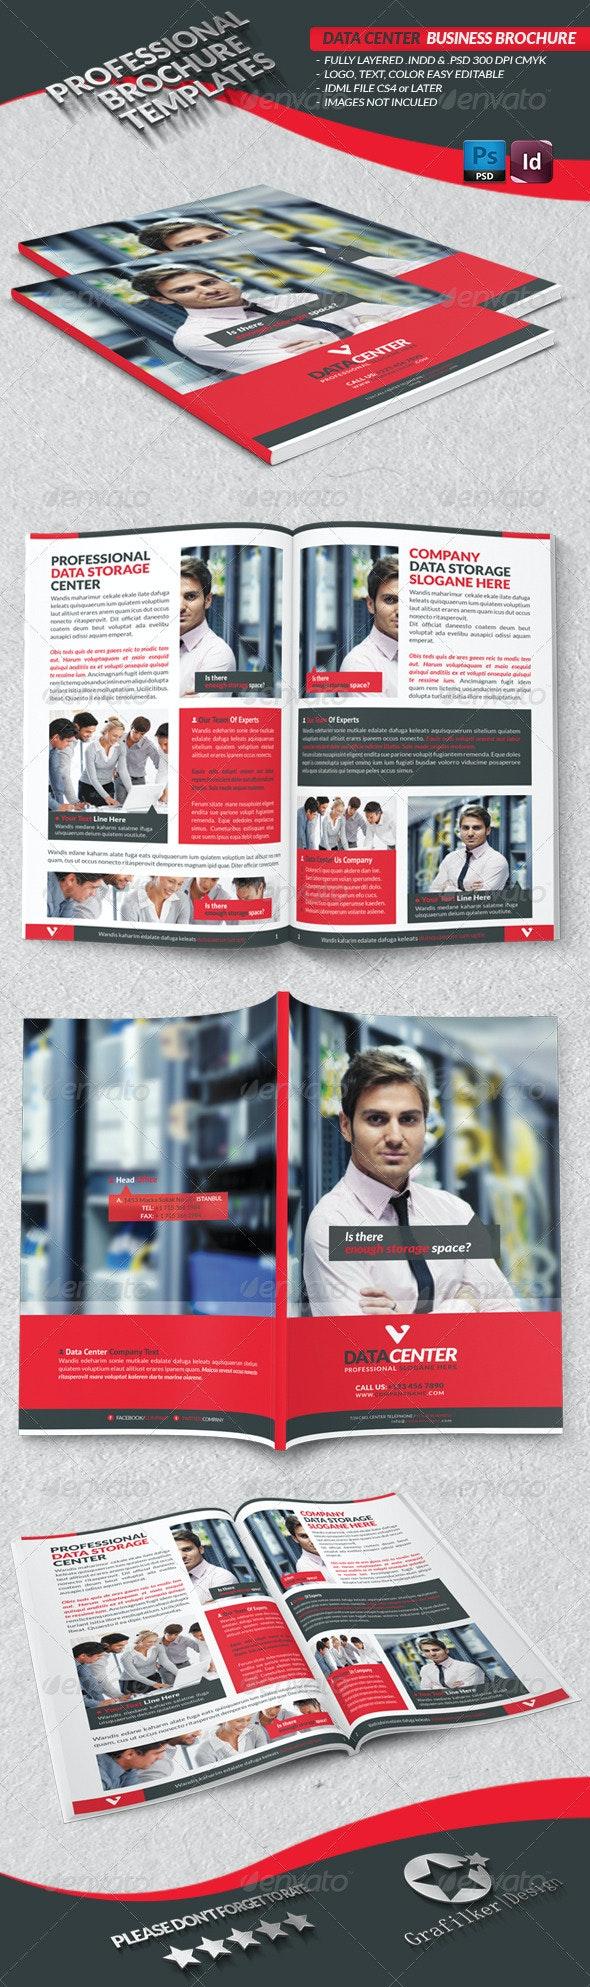 Data Center Business Brochure - Corporate Brochures